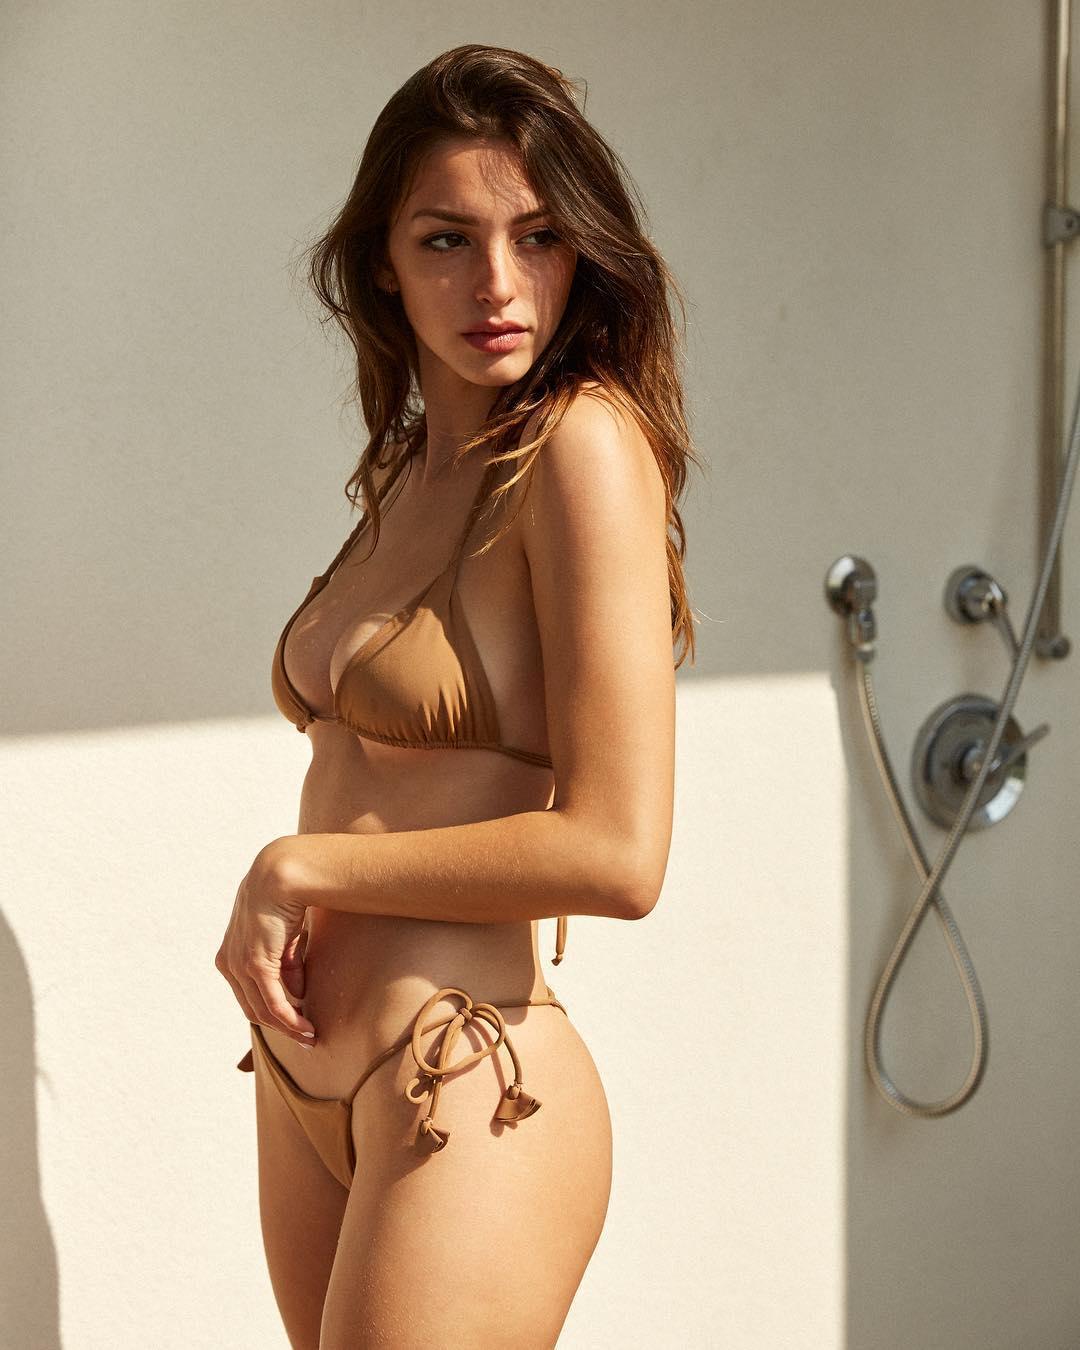 Too beautiful American model Celine Farrakhan033